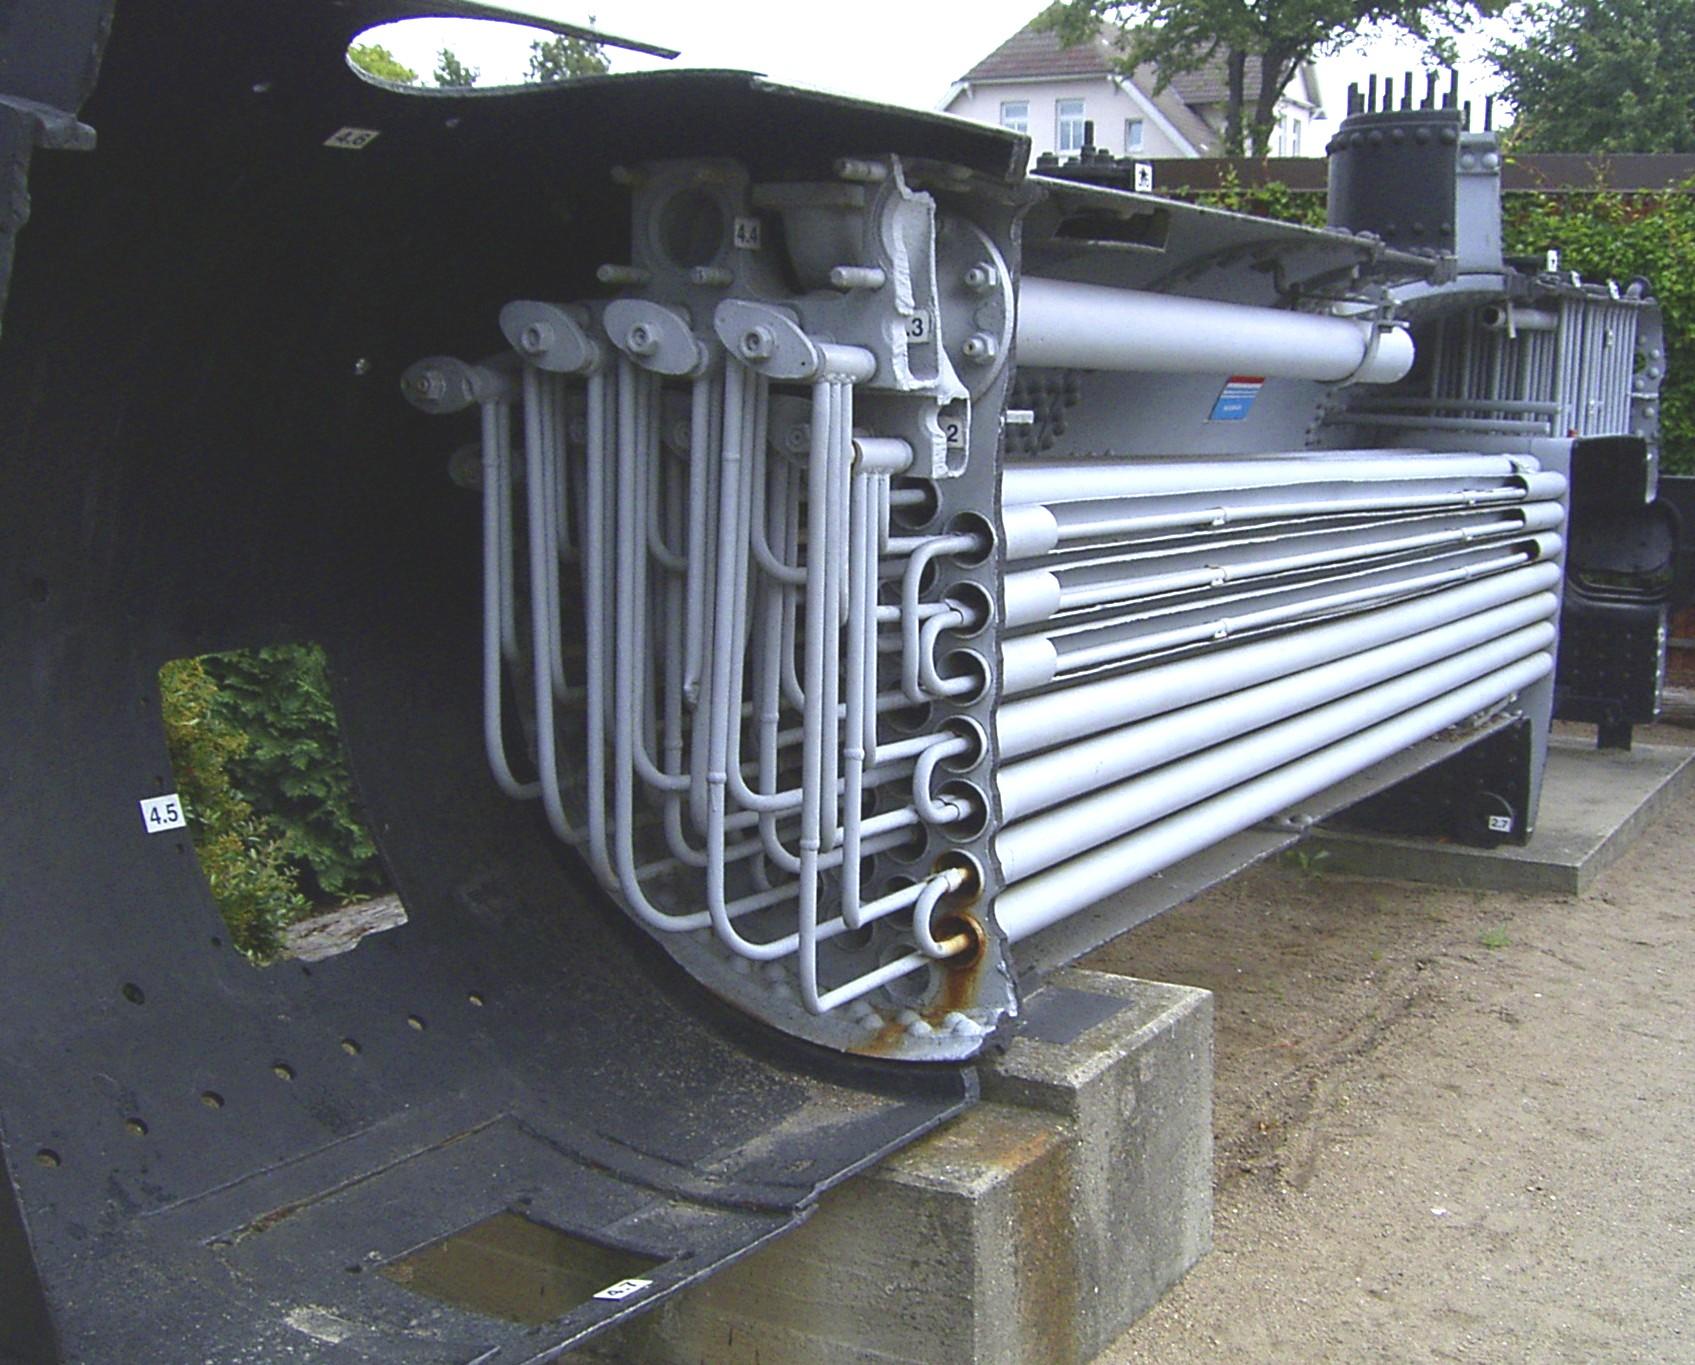 File:Dampfkessel Überhitzerrohre.jpg - Wikimedia Commons